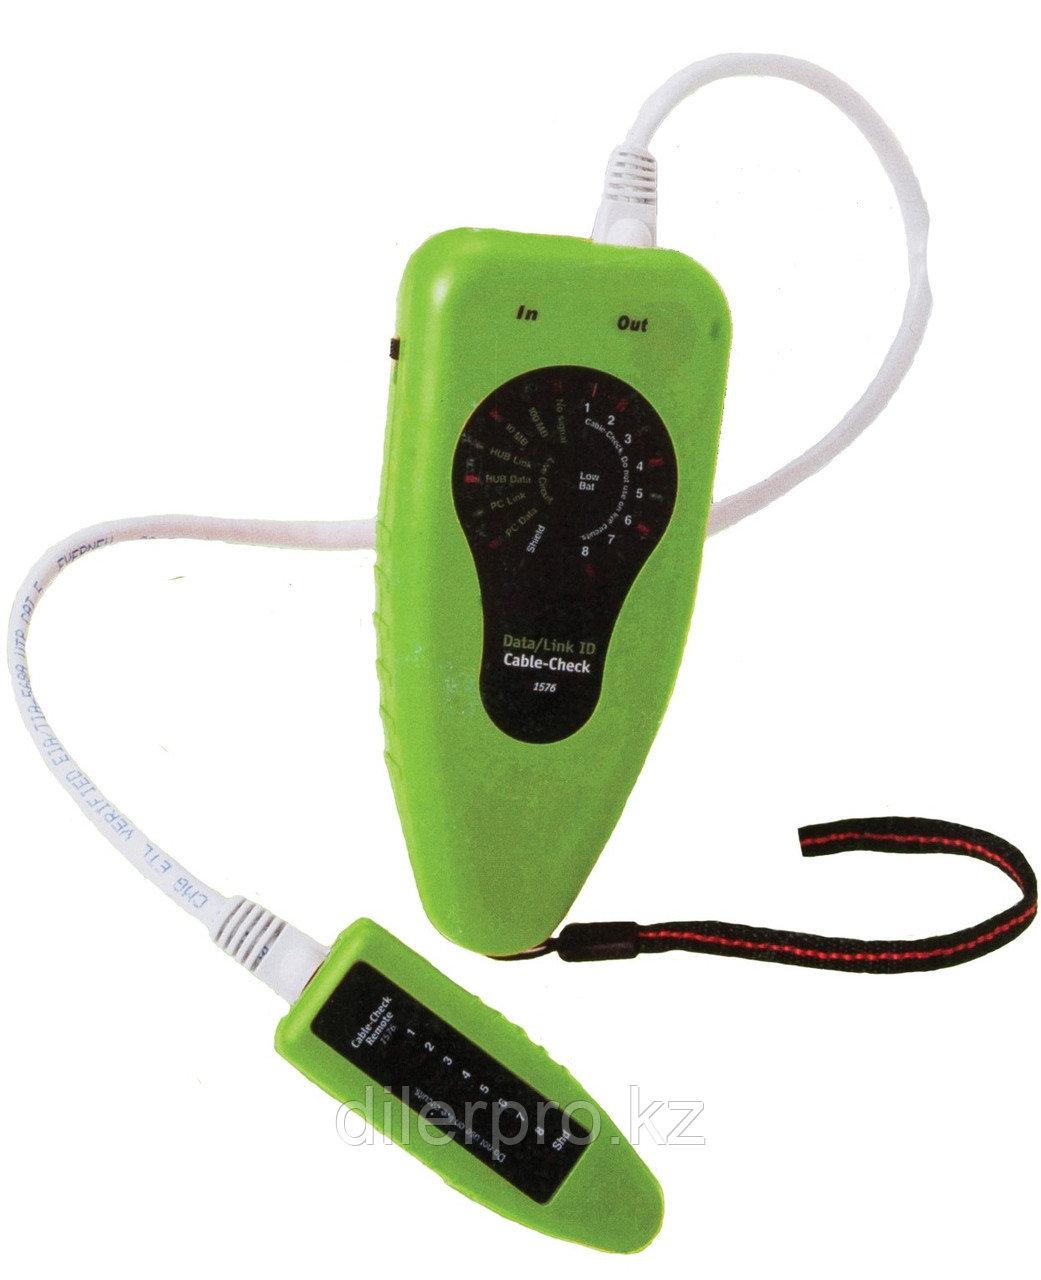 Greenlee 1576 - кабельный тестер Data/Link ID Cable-Check